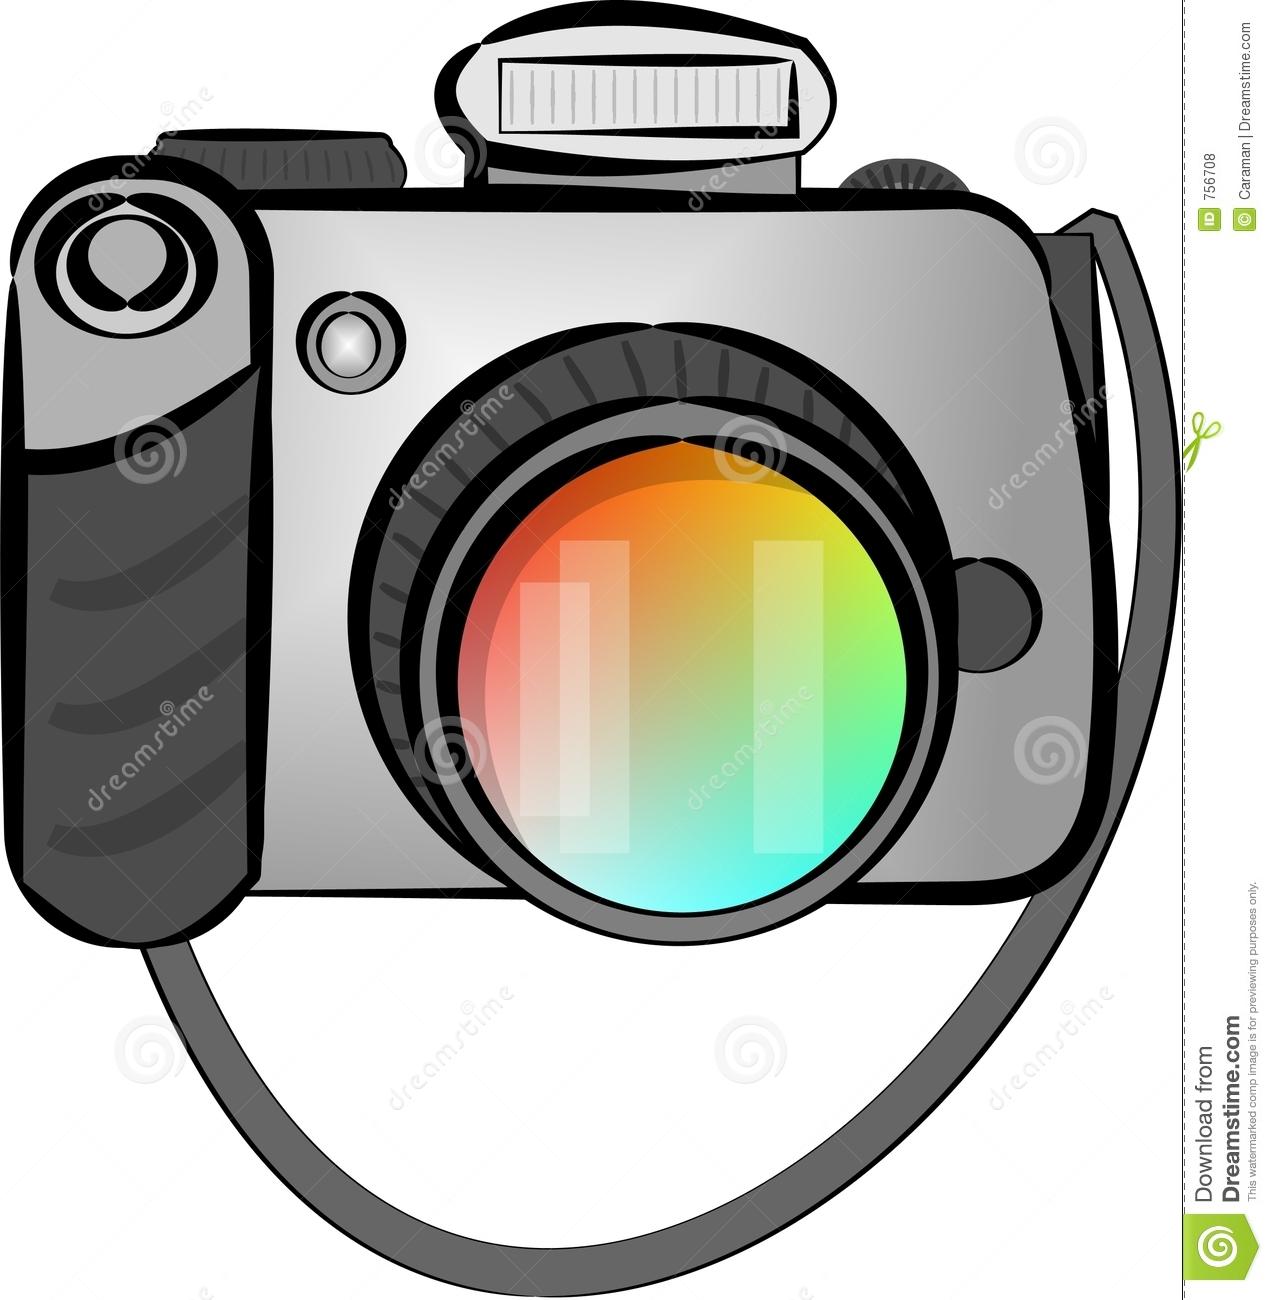 free clipart slr camera - photo #19